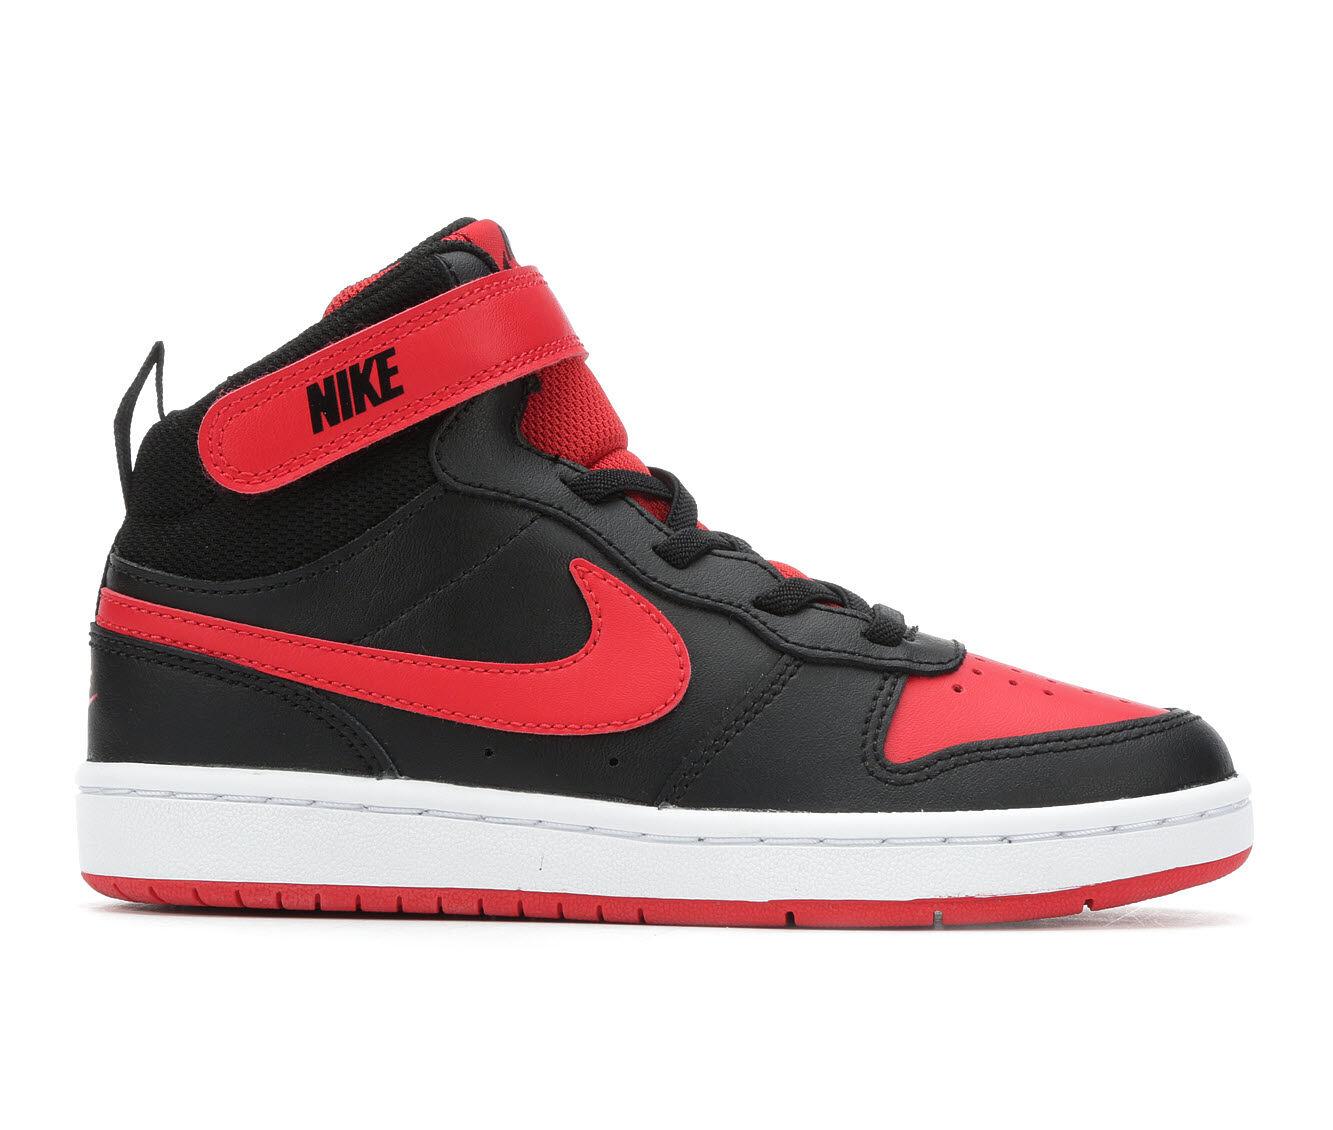 Boys' High Top Sneakers | Shoe Carnival